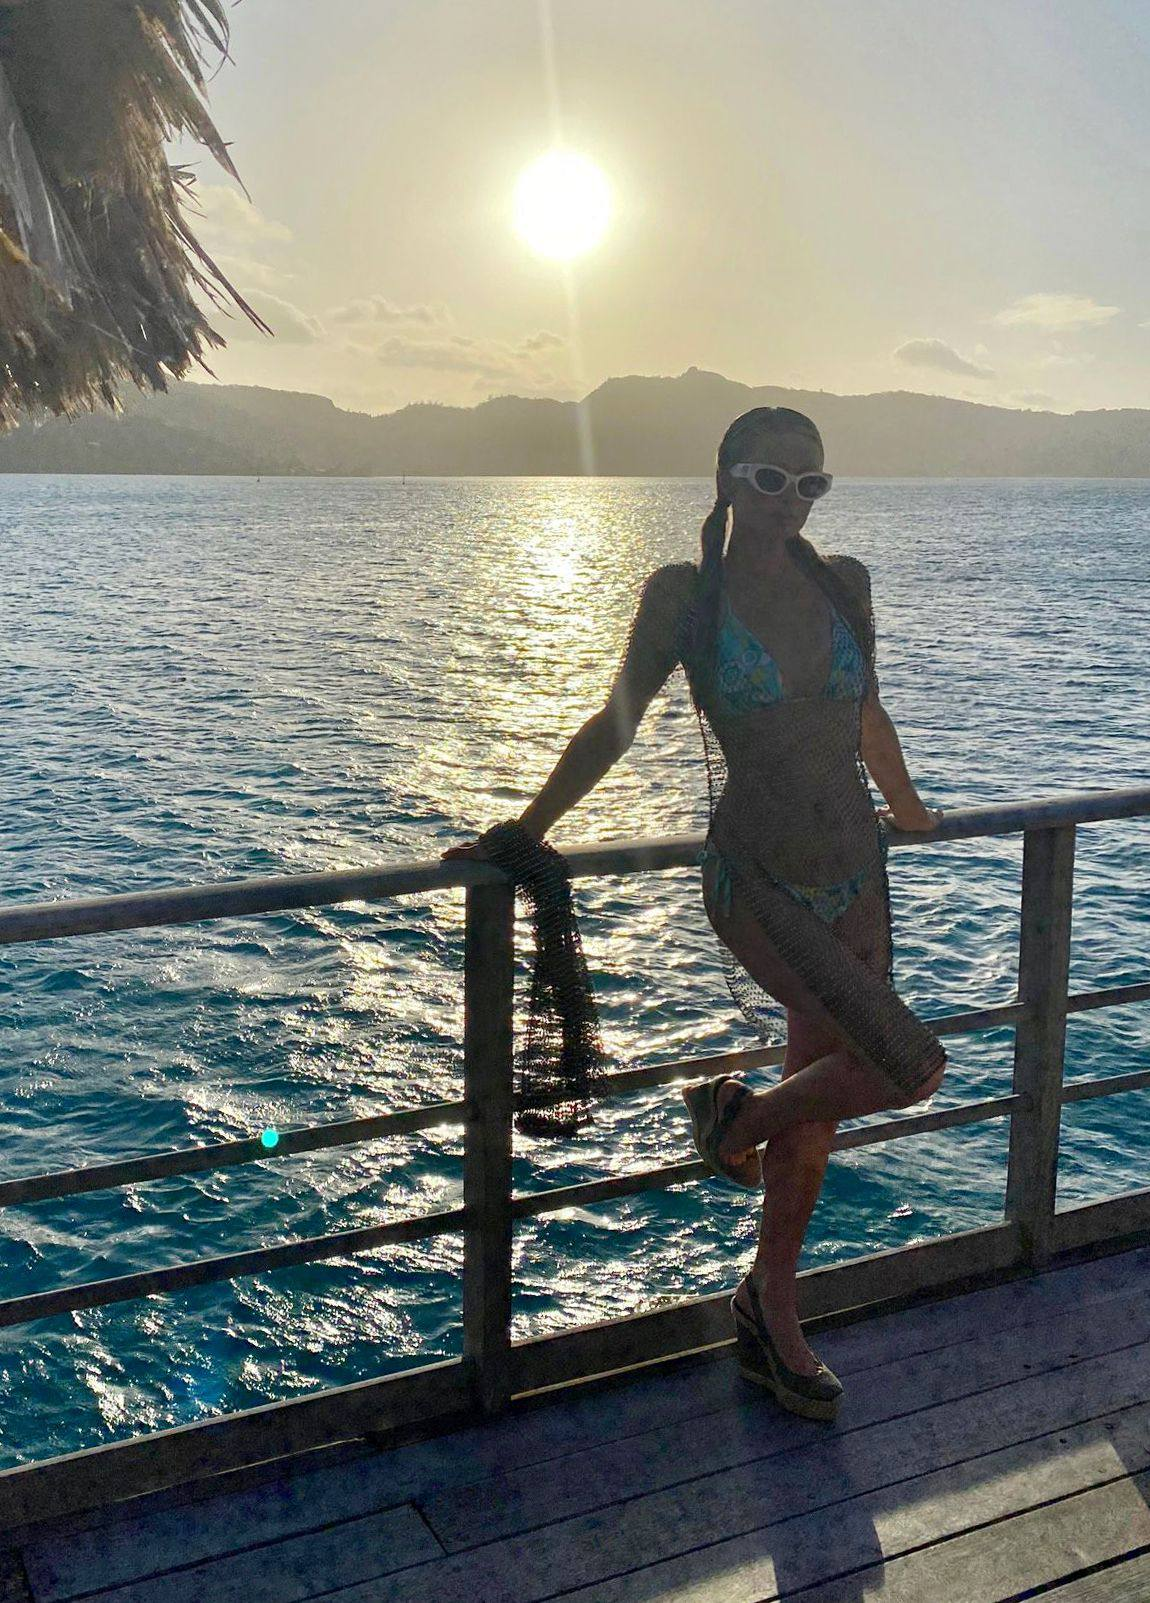 Paris Hilton Beautiful Pics